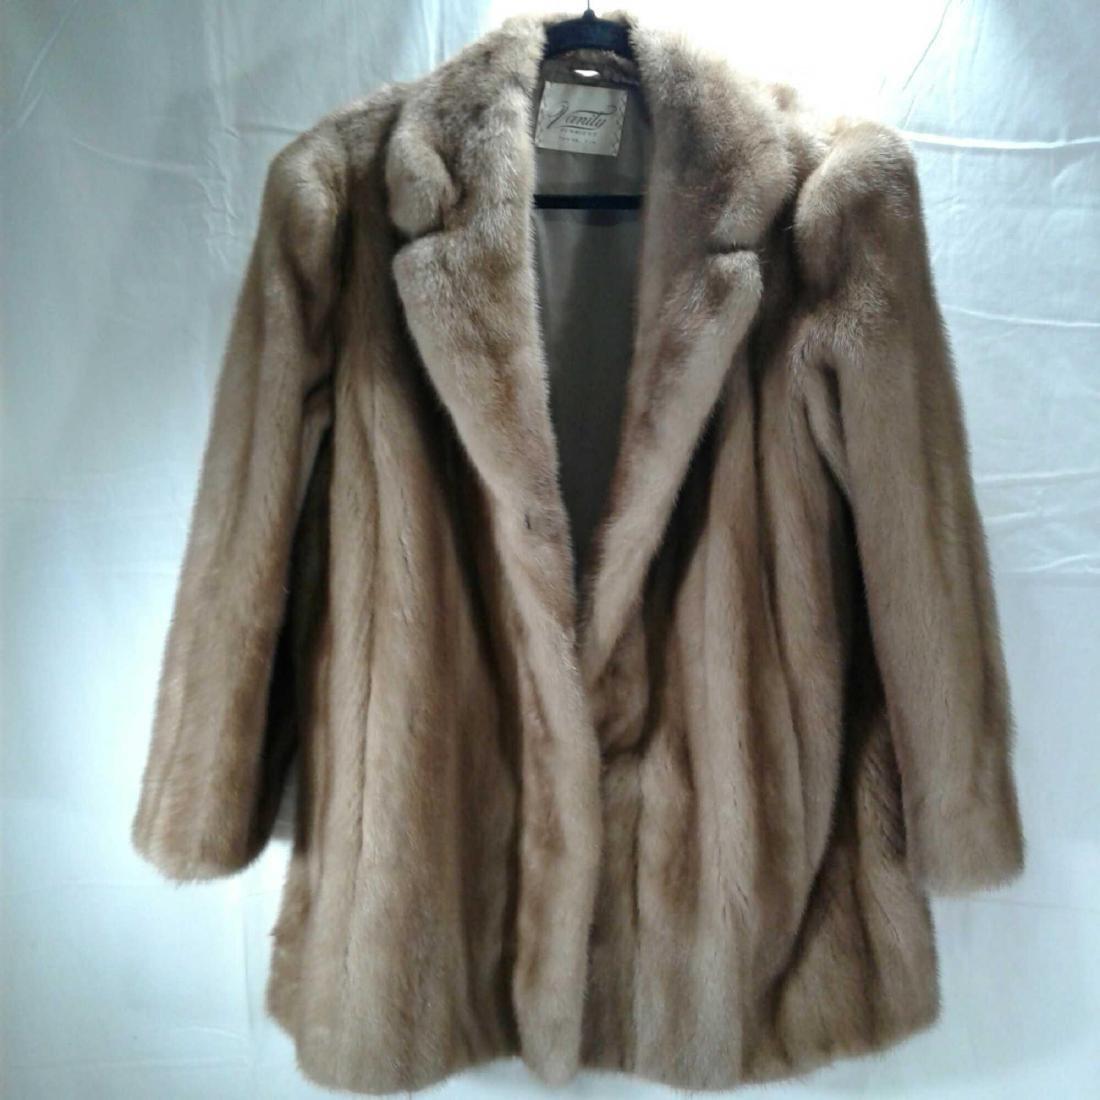 Carmen Salerno Fur Coat